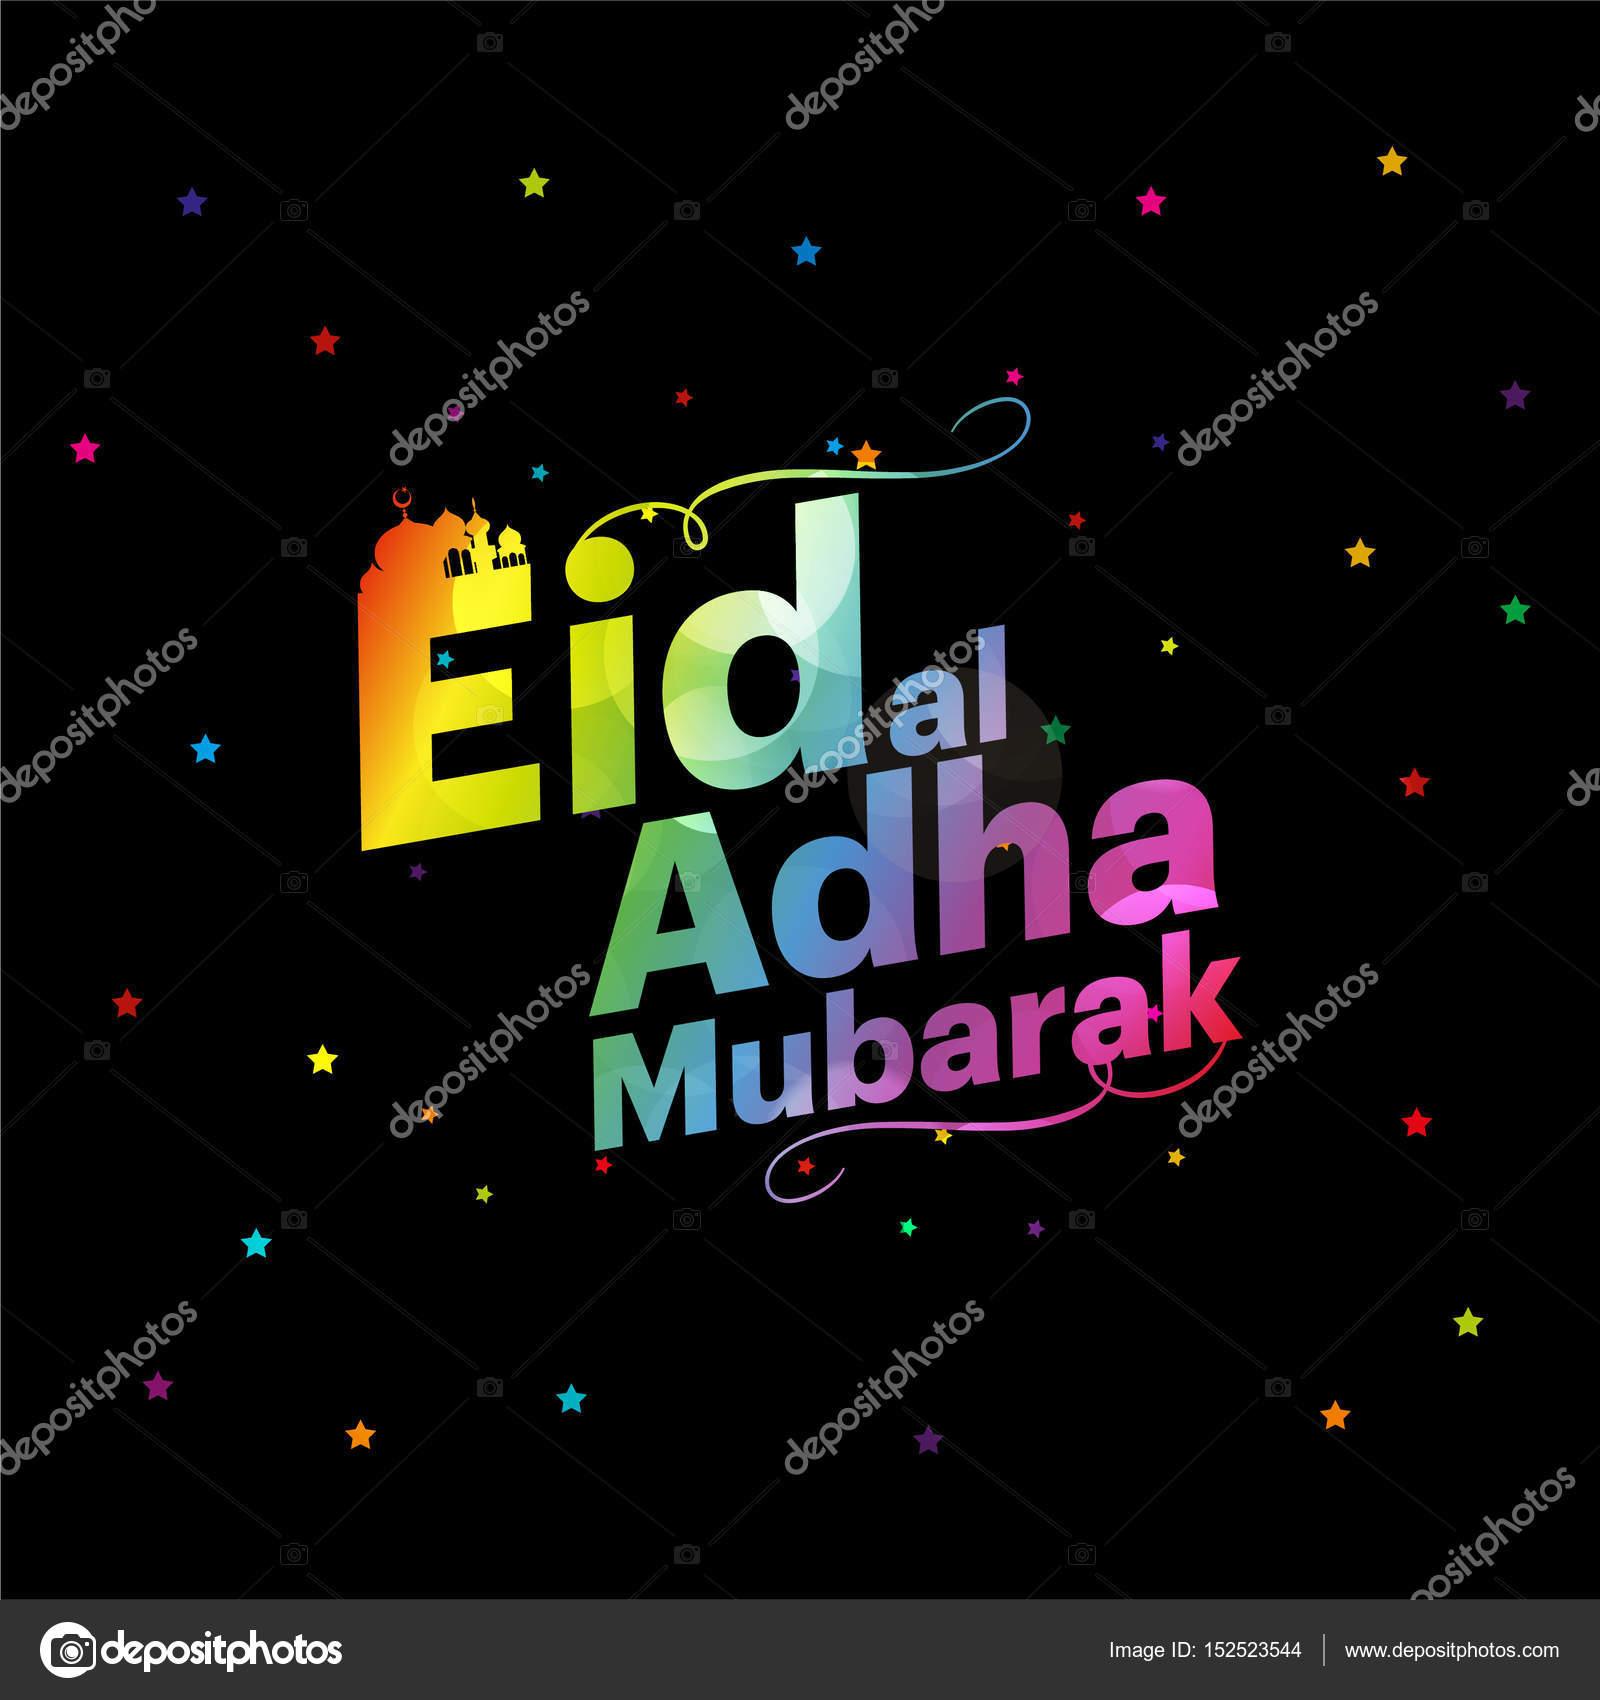 Eid mubarak traditional muslim greeting muslim greetings eid mubarak traditional muslim greeting muslim greetings background vector illustration stock m4hsunfo